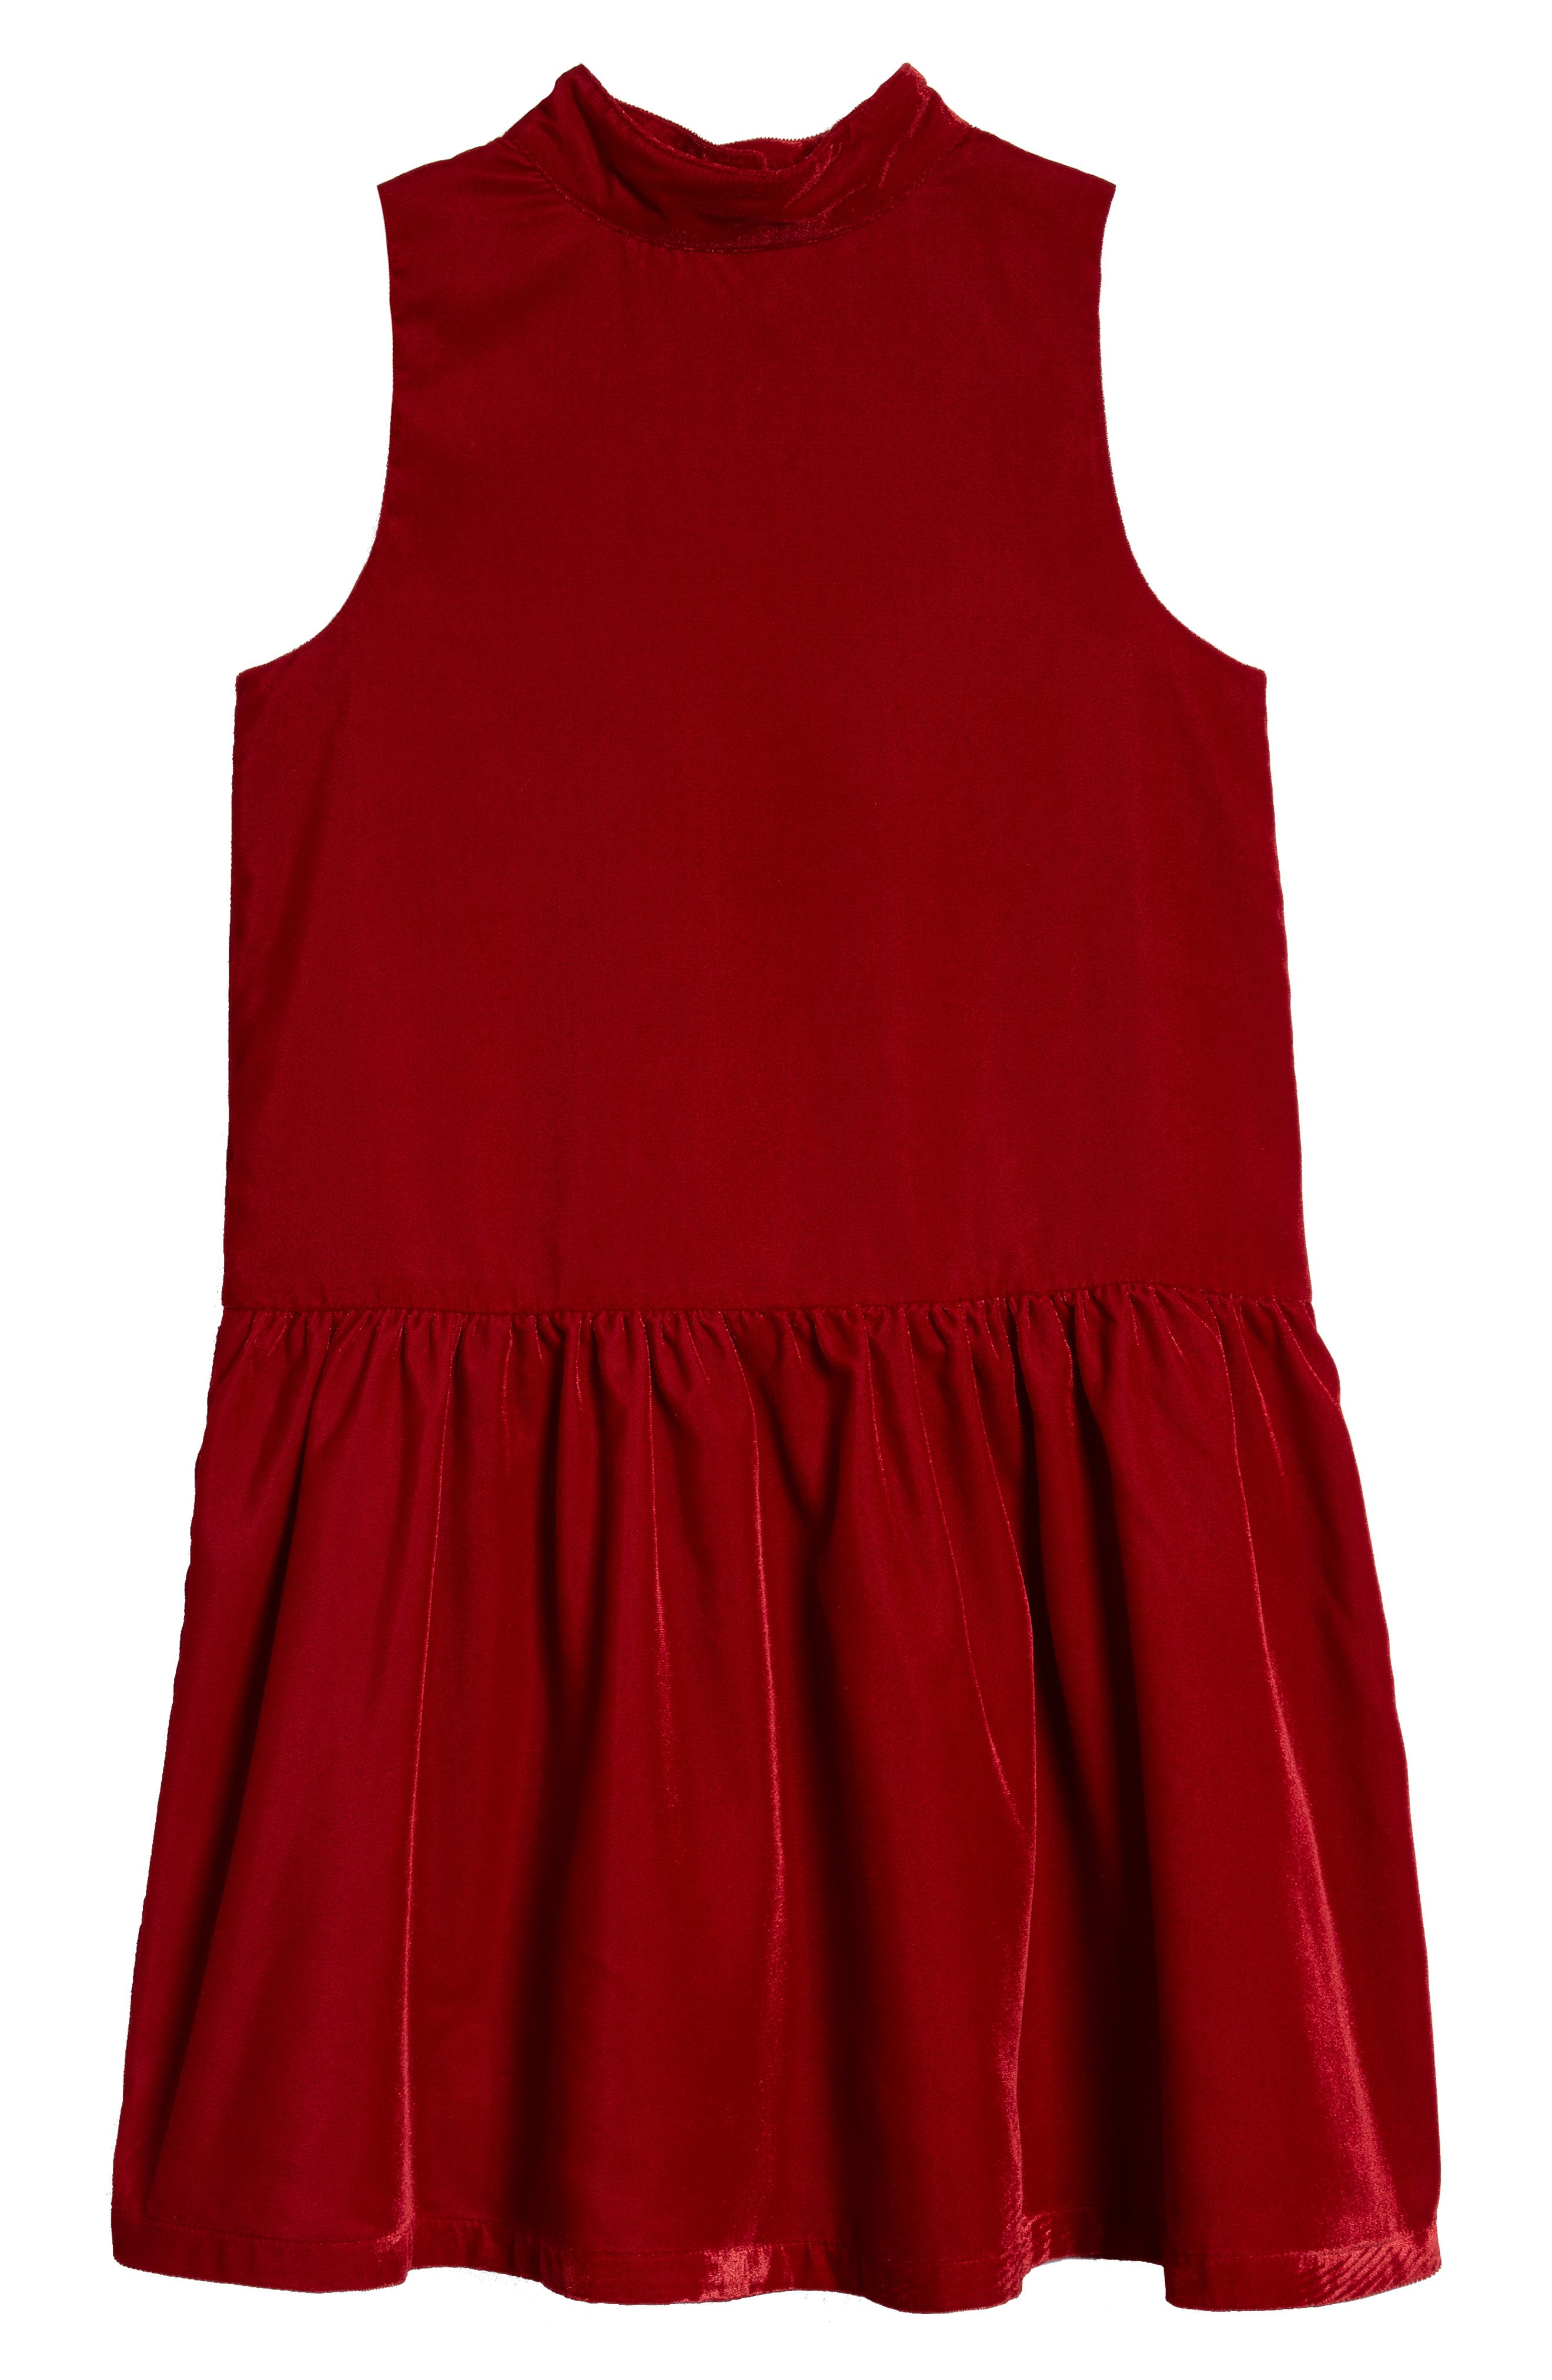 Ruby & Bloom Velvet Drop Waist Dress (Toddler Girls, Little Girls & Big Girls)